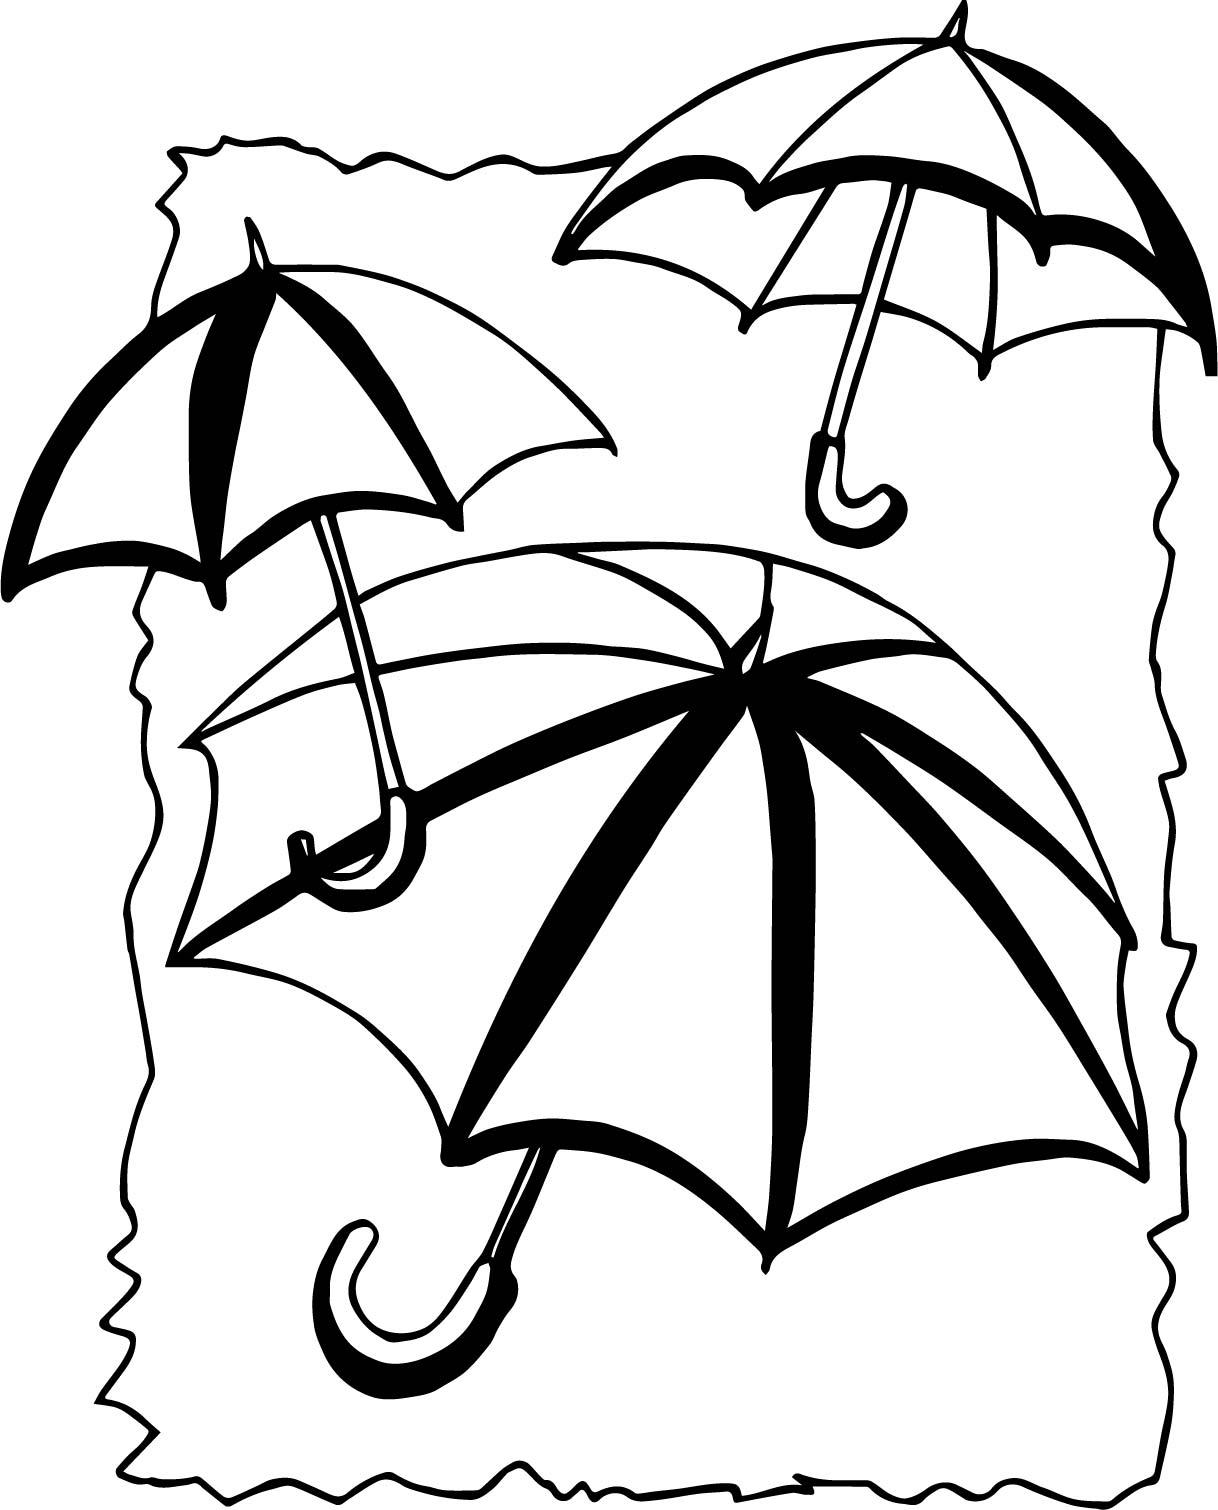 April Shower Umbrellas Coloring Page